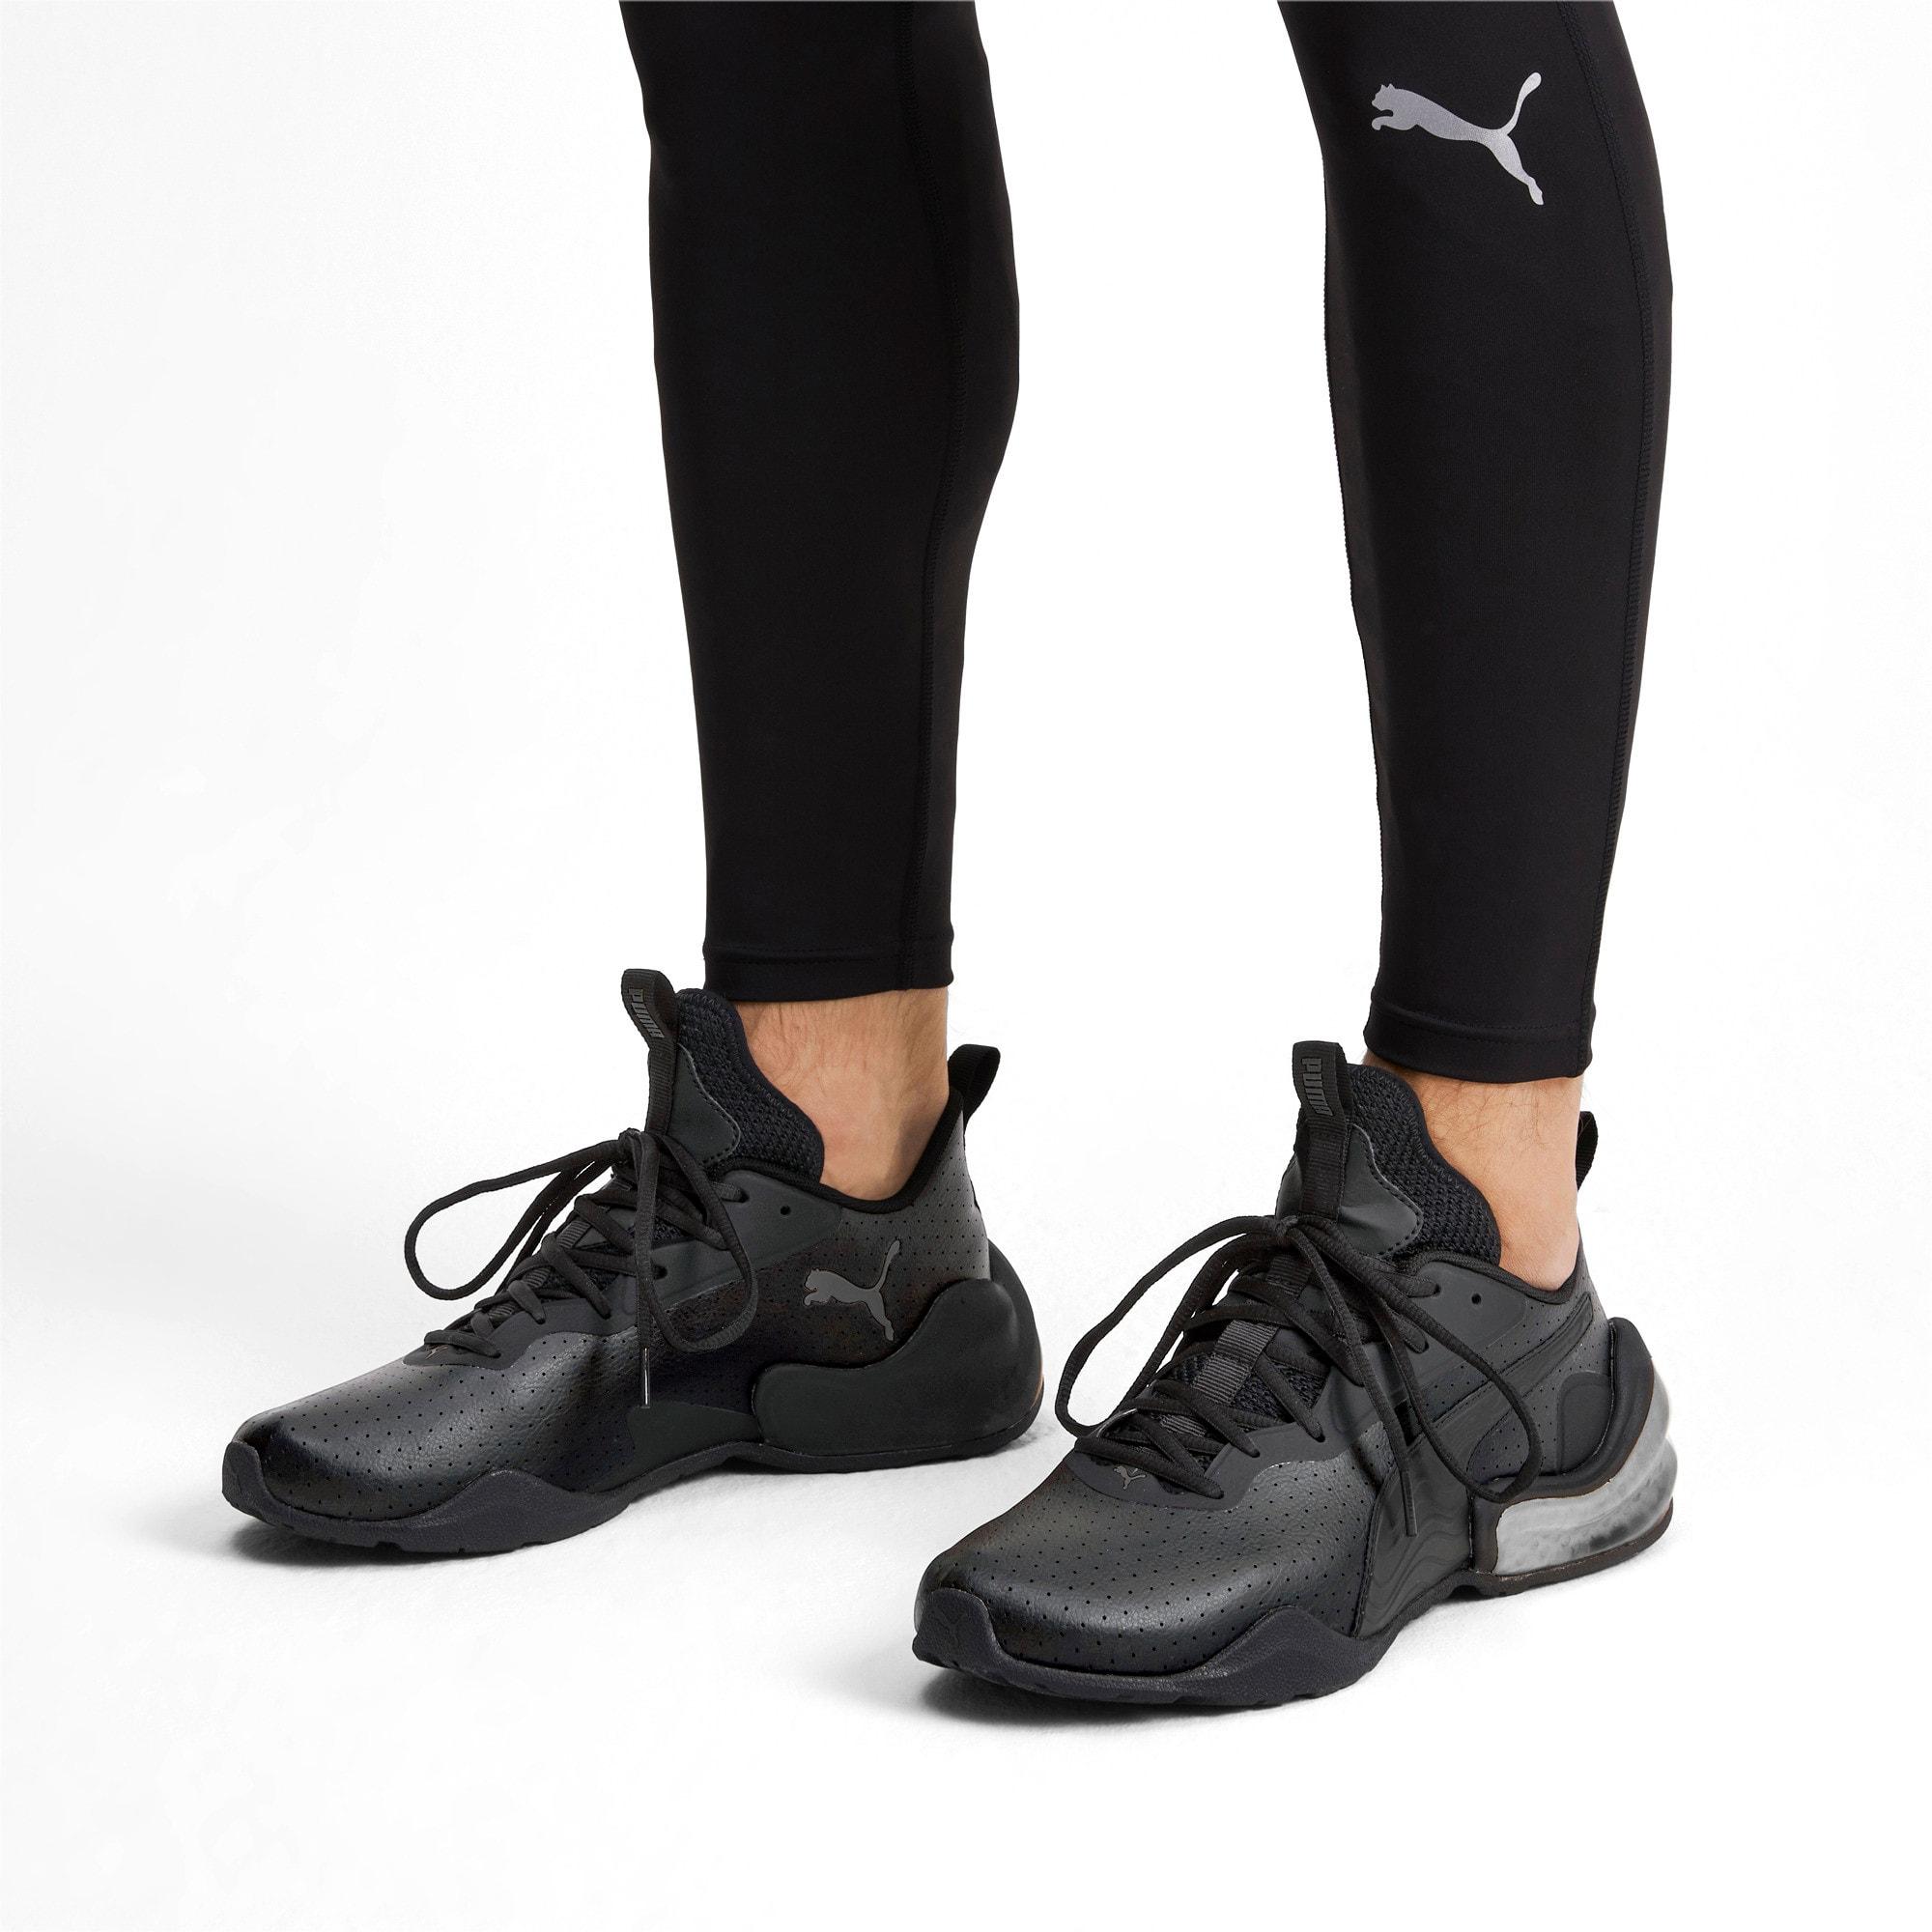 Thumbnail 3 of LQDCELL Challenge Perf Men's Training Shoes, Puma Black-CASTLEROCK, medium